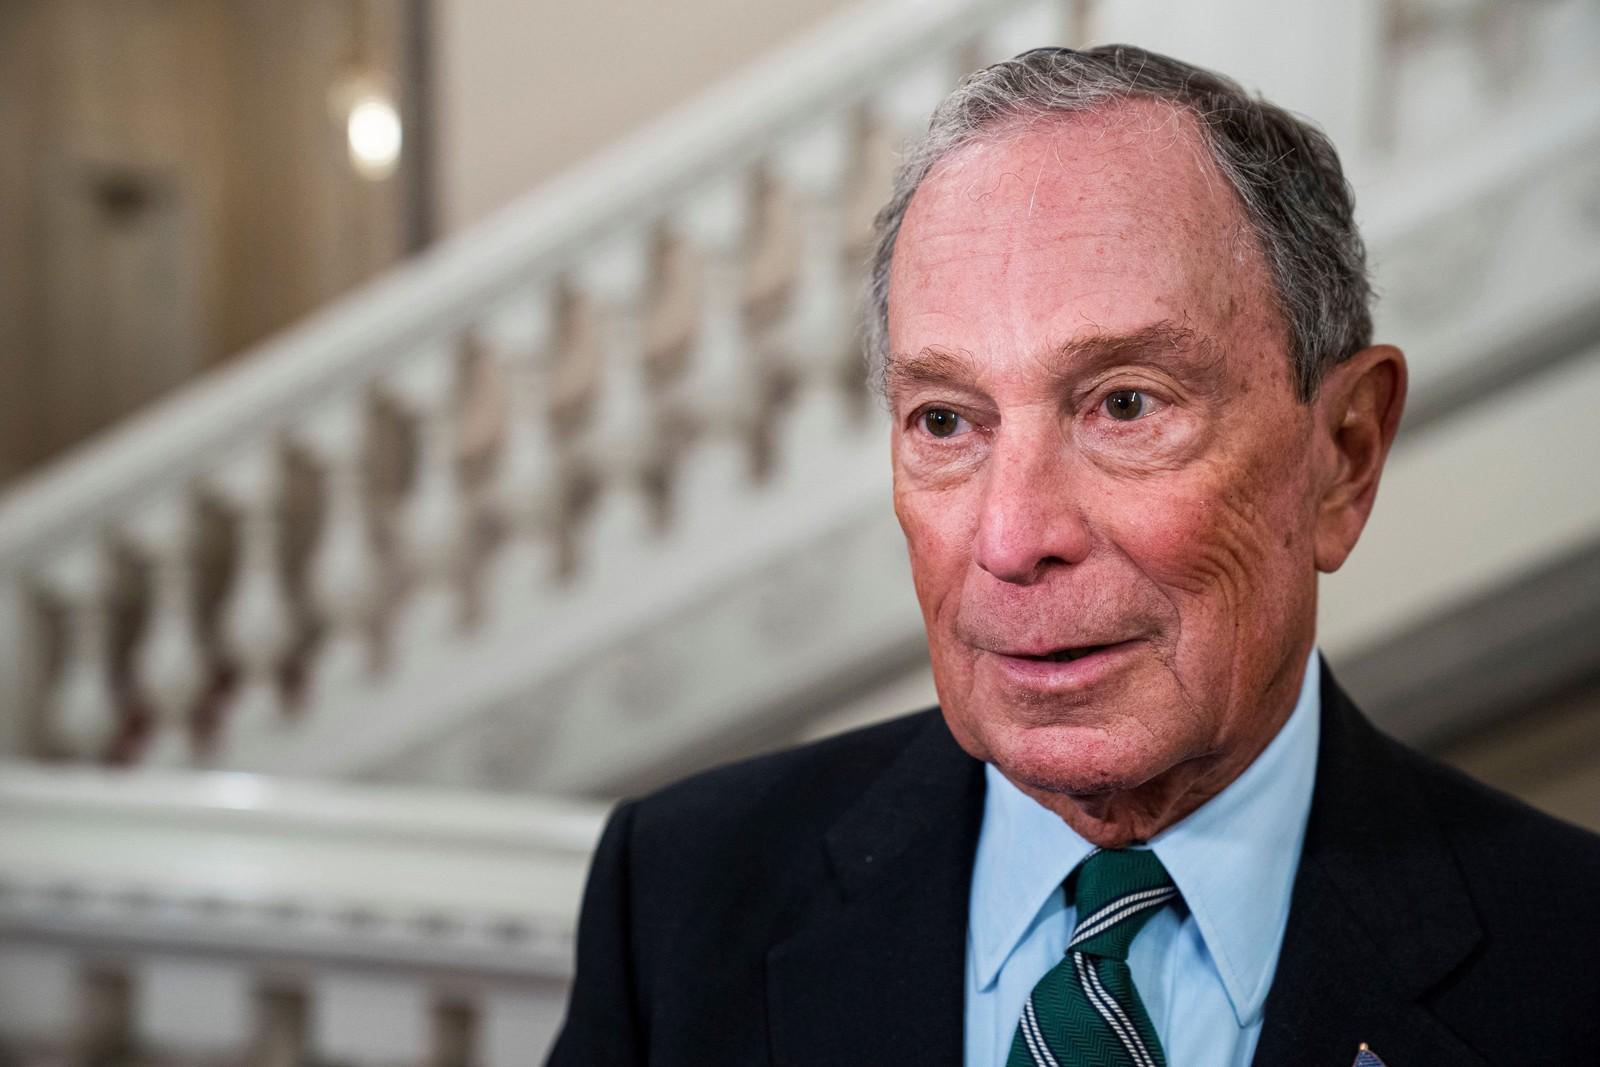 Bloomberg considera participar da corrida presidencial democrata em 2020